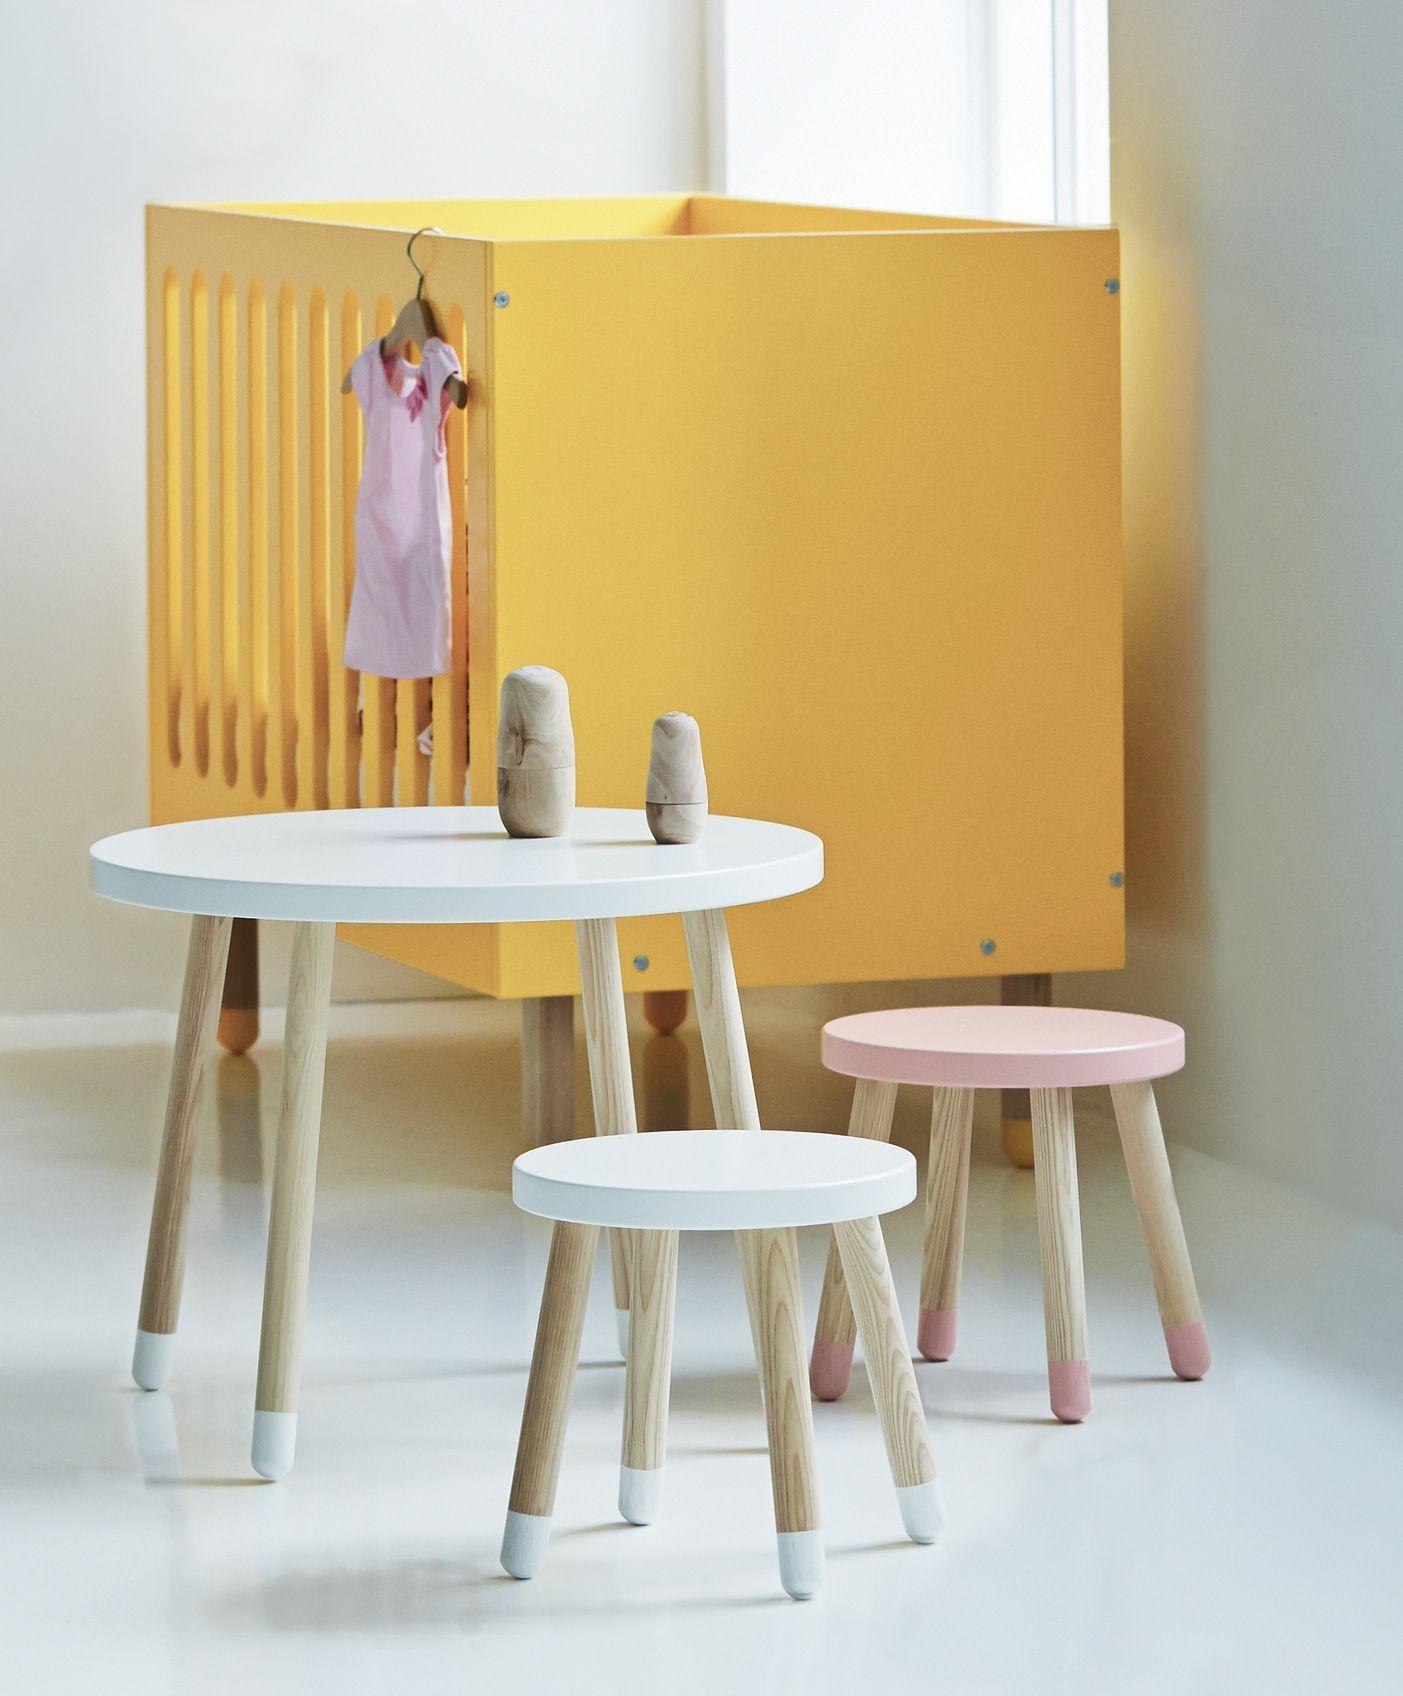 Flexa - Play Børnebord - Hvid - Flexa legebord - hvid -  Ø60 cm